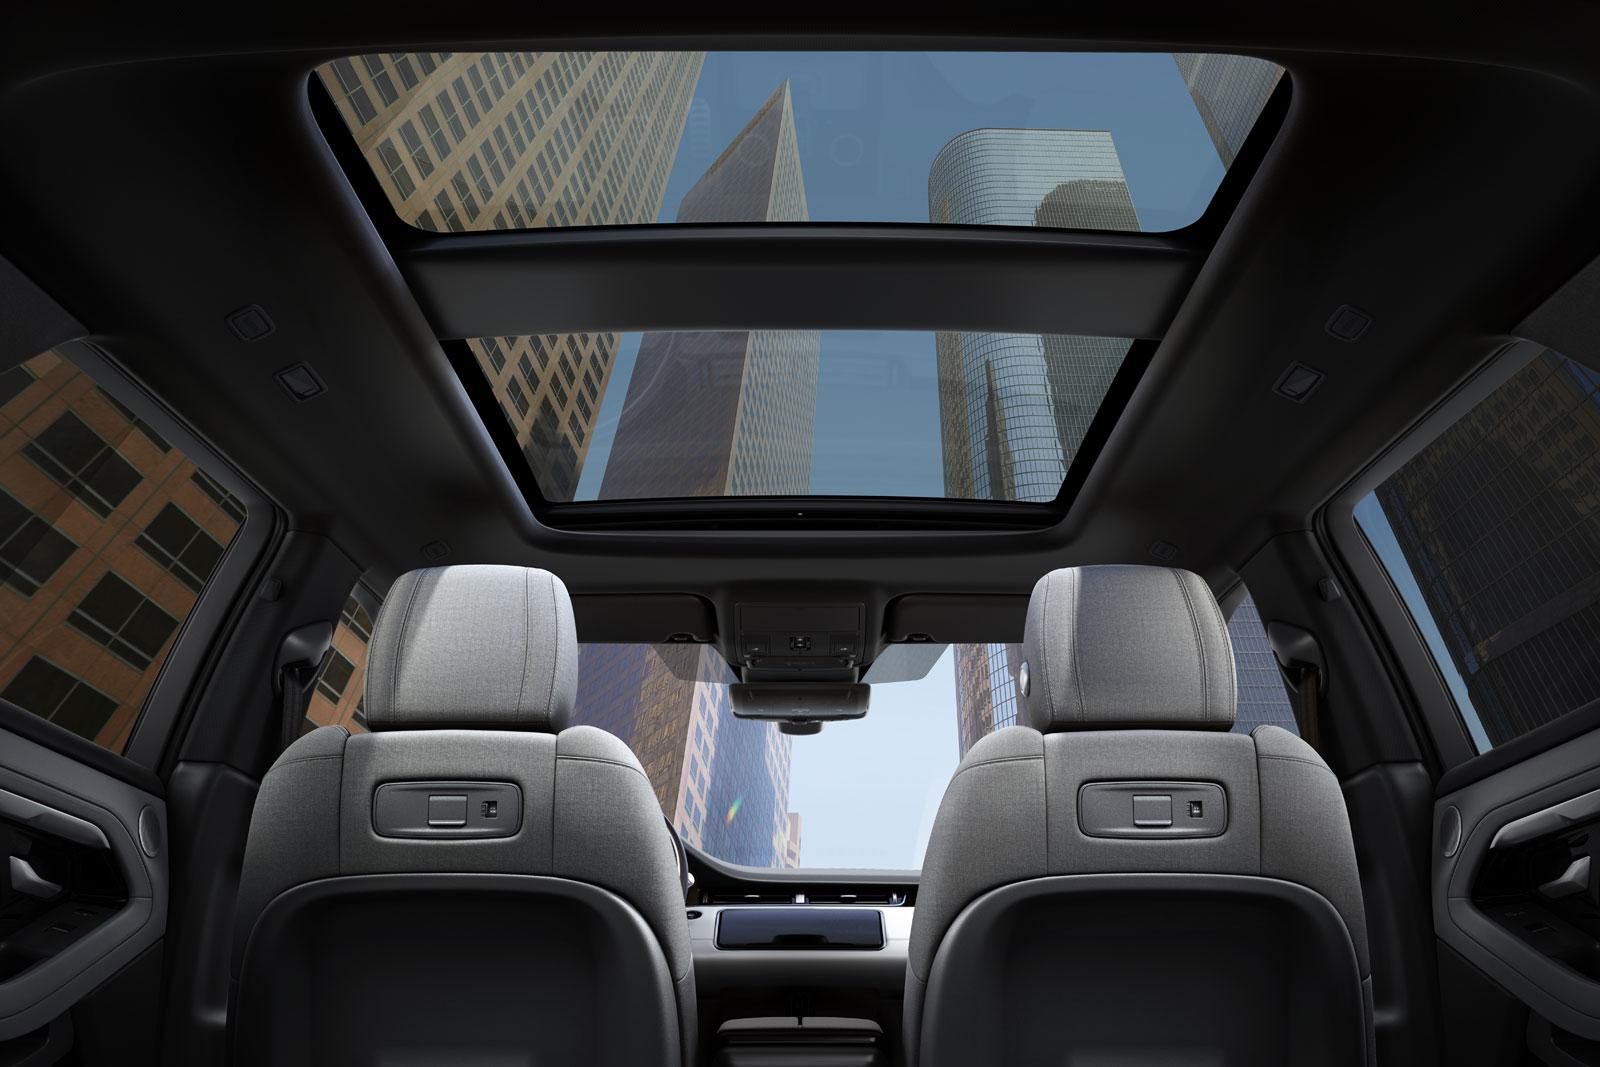 Range Rover Evoque Interior >> New Range Rover Evoque Interior Design Car Body Design